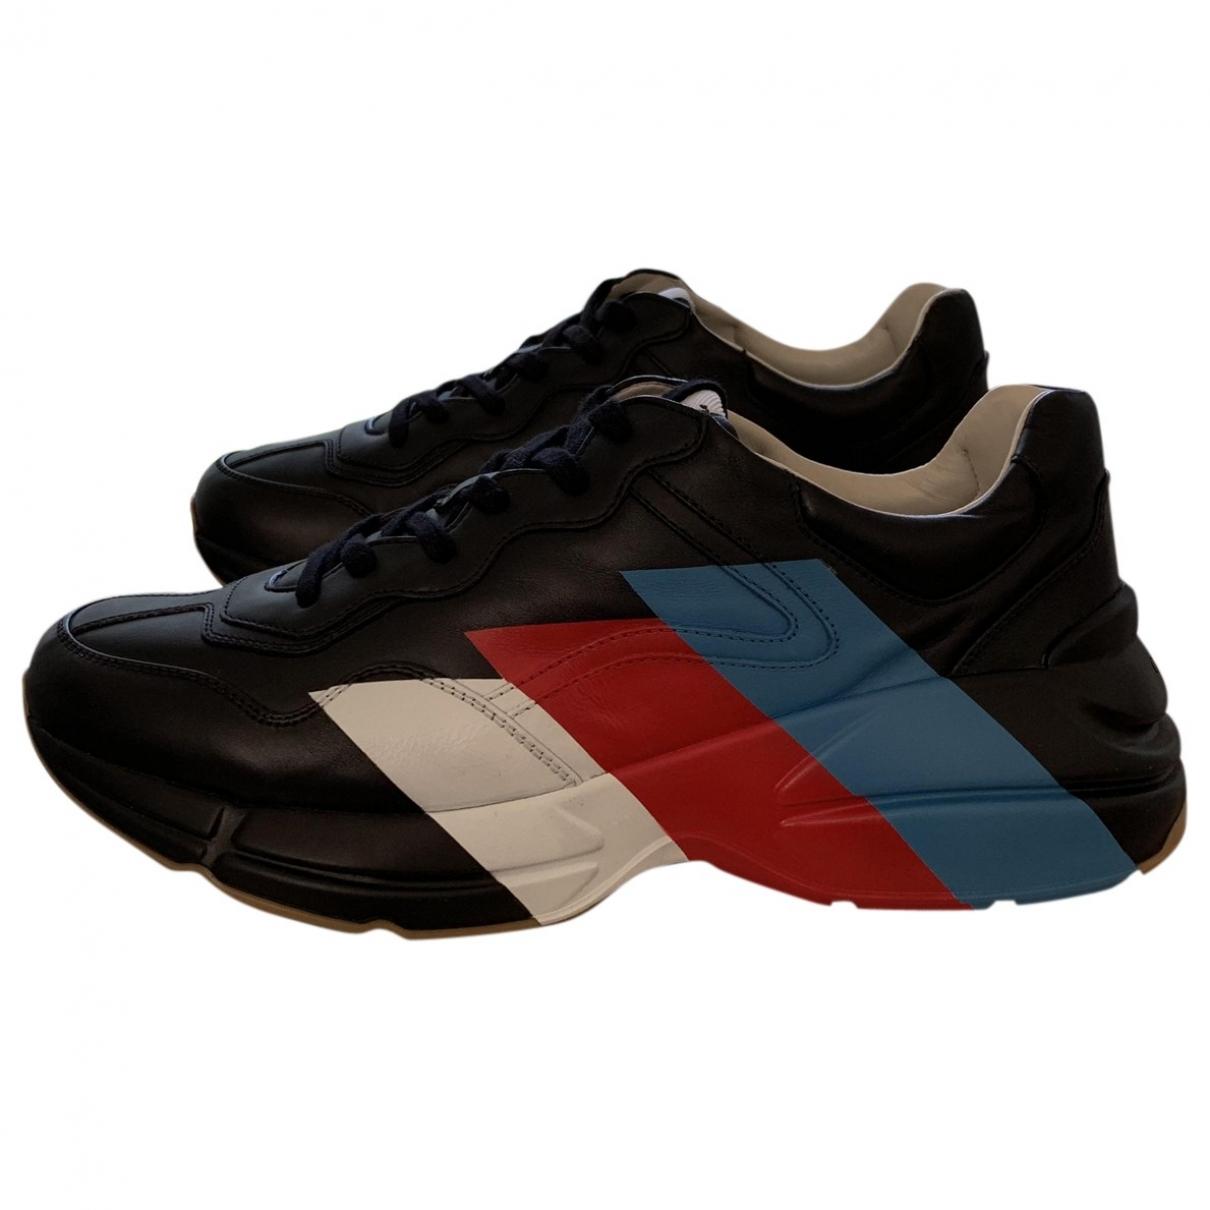 Gucci Rhyton Sneakers in  Schwarz Leder